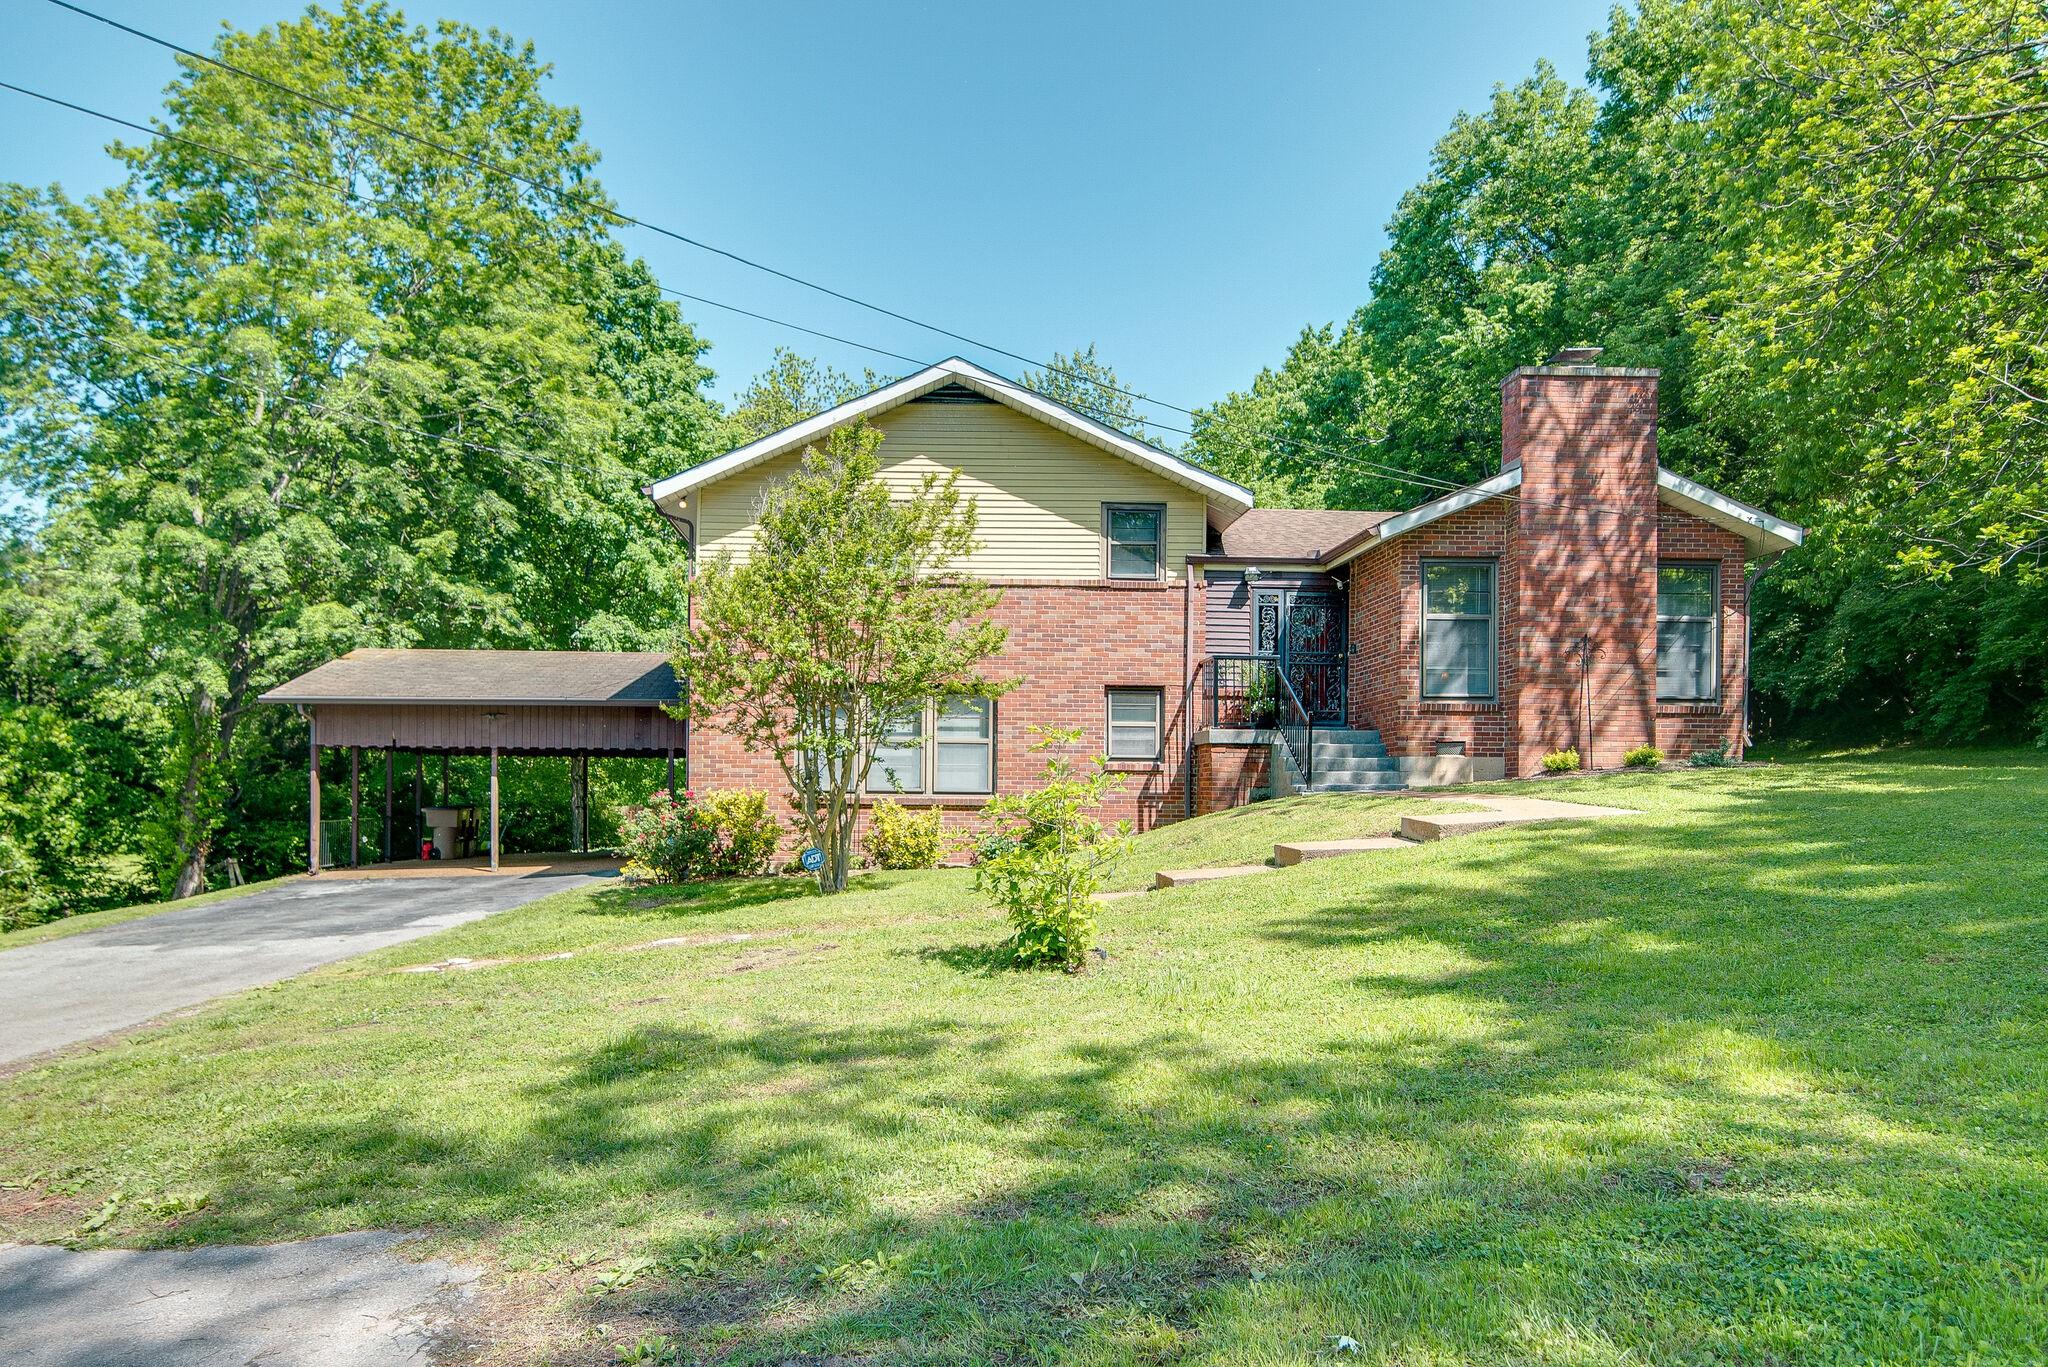 324 Foxglove Dr Property Photo - Nashville, TN real estate listing